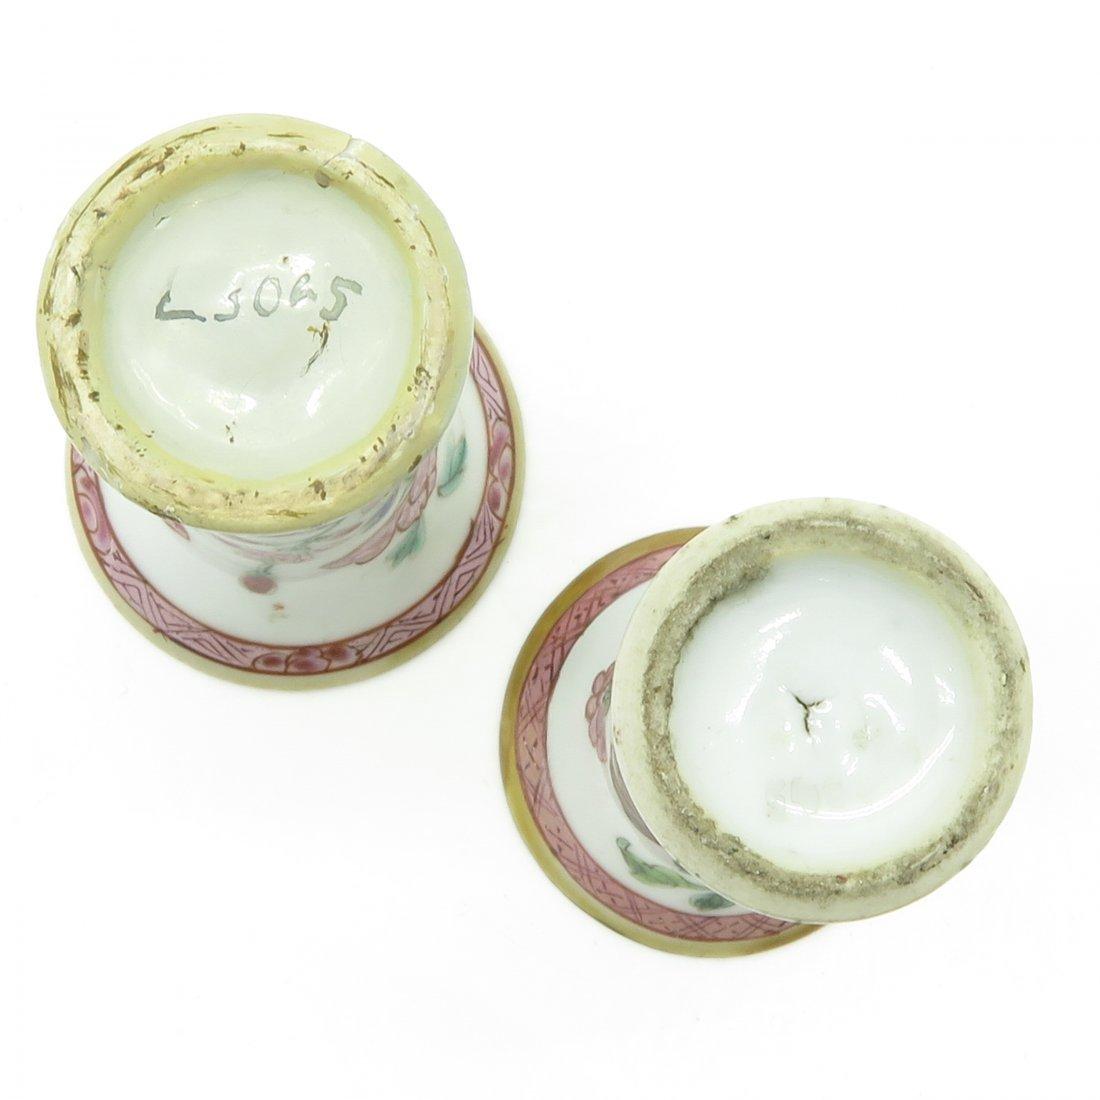 Lot of 2 China Porcelain Miniature Vases - 6